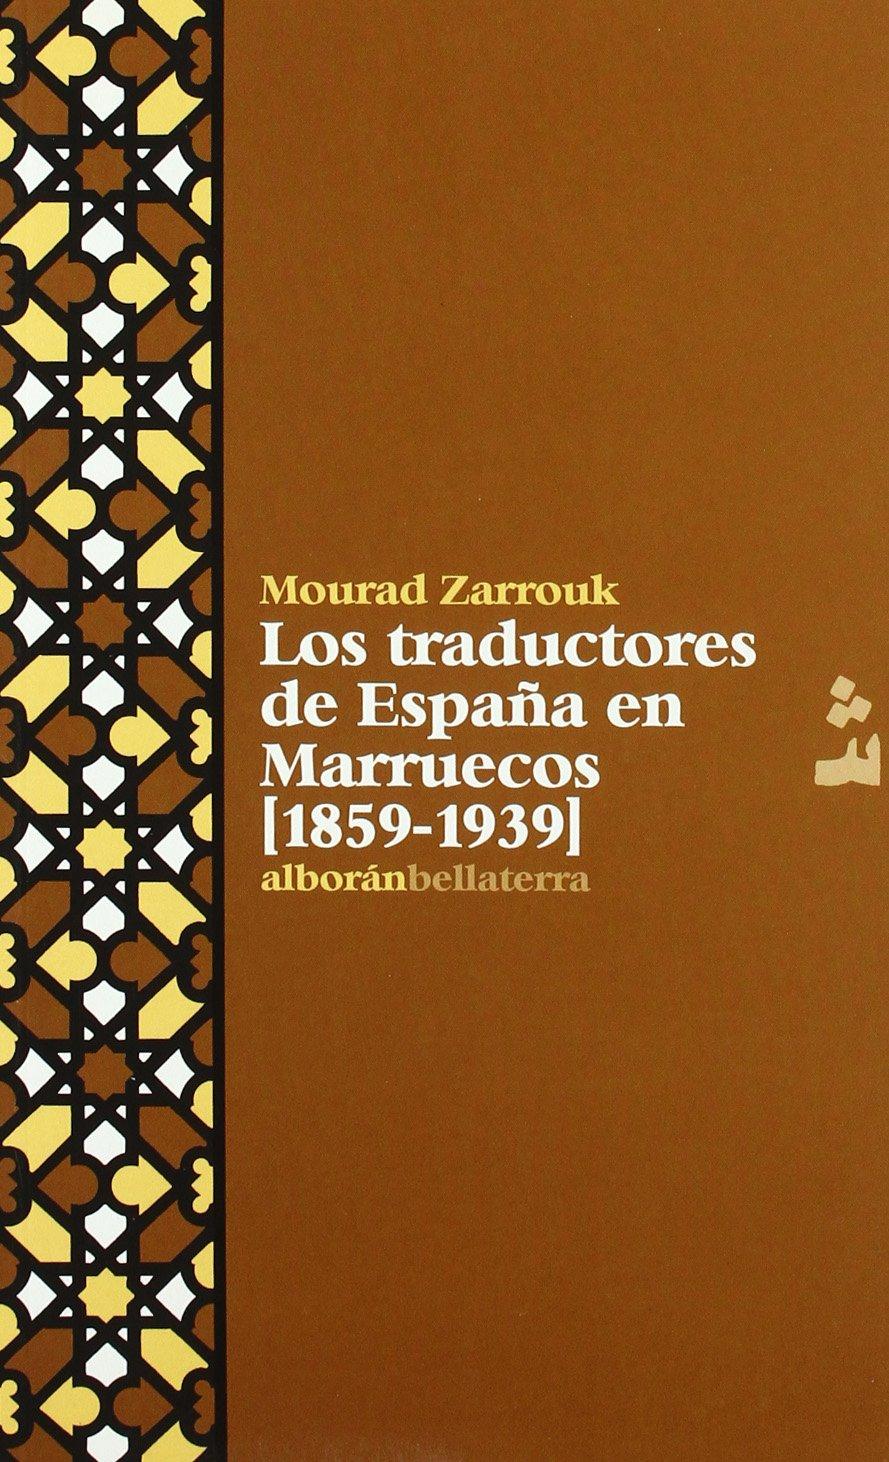 Traductores de España en Marruecos. 1859-1939 Alboran bellaterra: Amazon.es: Zarrouk Mourad, Zarrouk Mourad: Libros